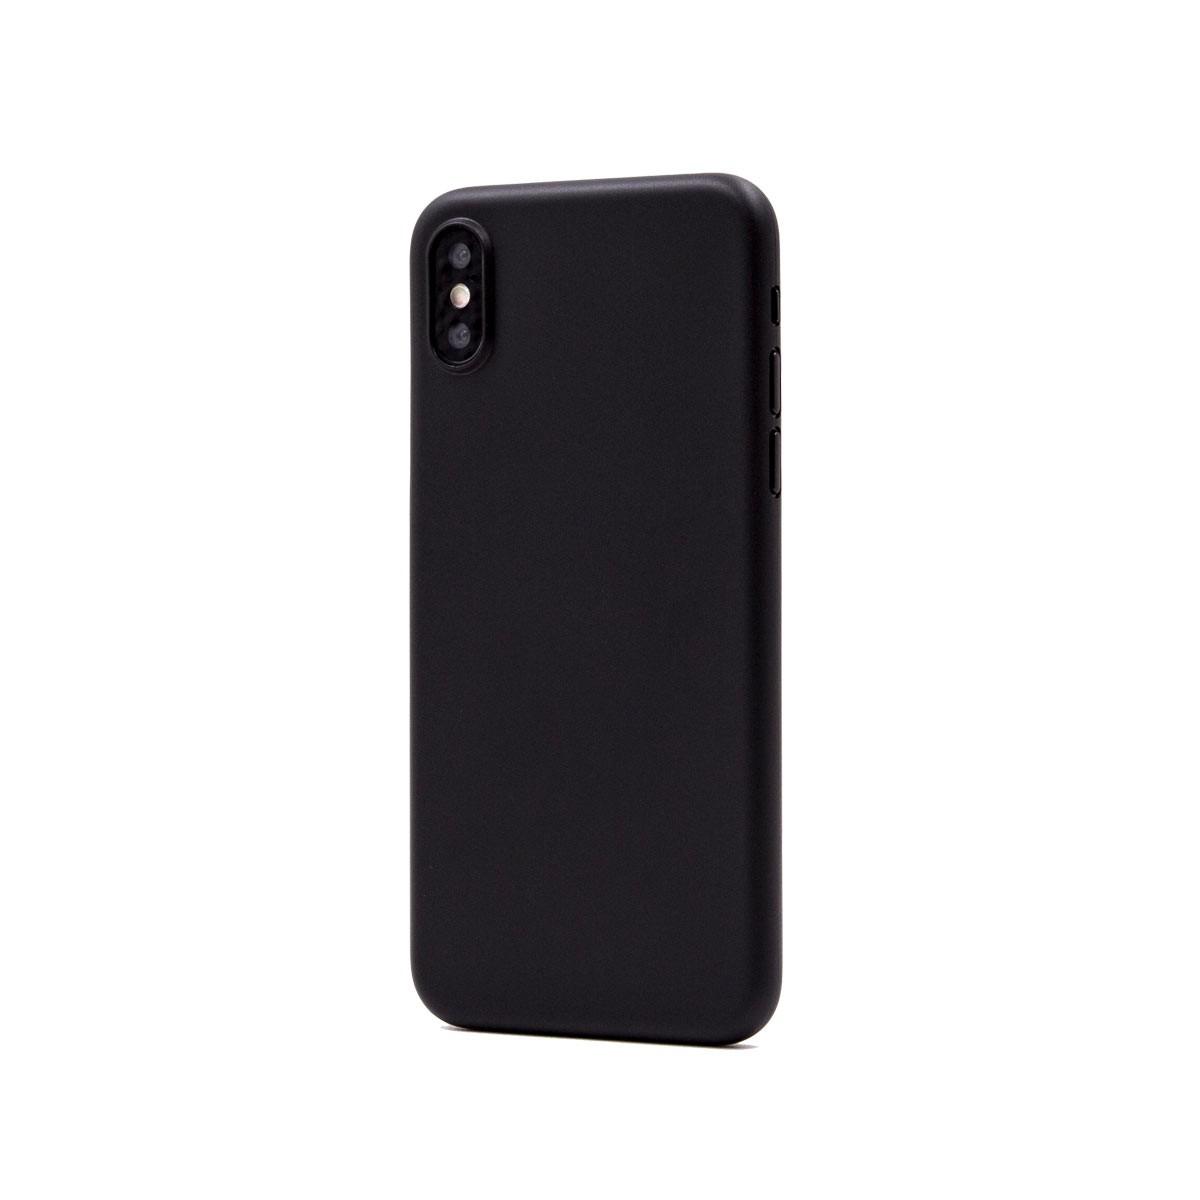 Capac protectie spate cellara colectia thin pentru iphone xs max - negru